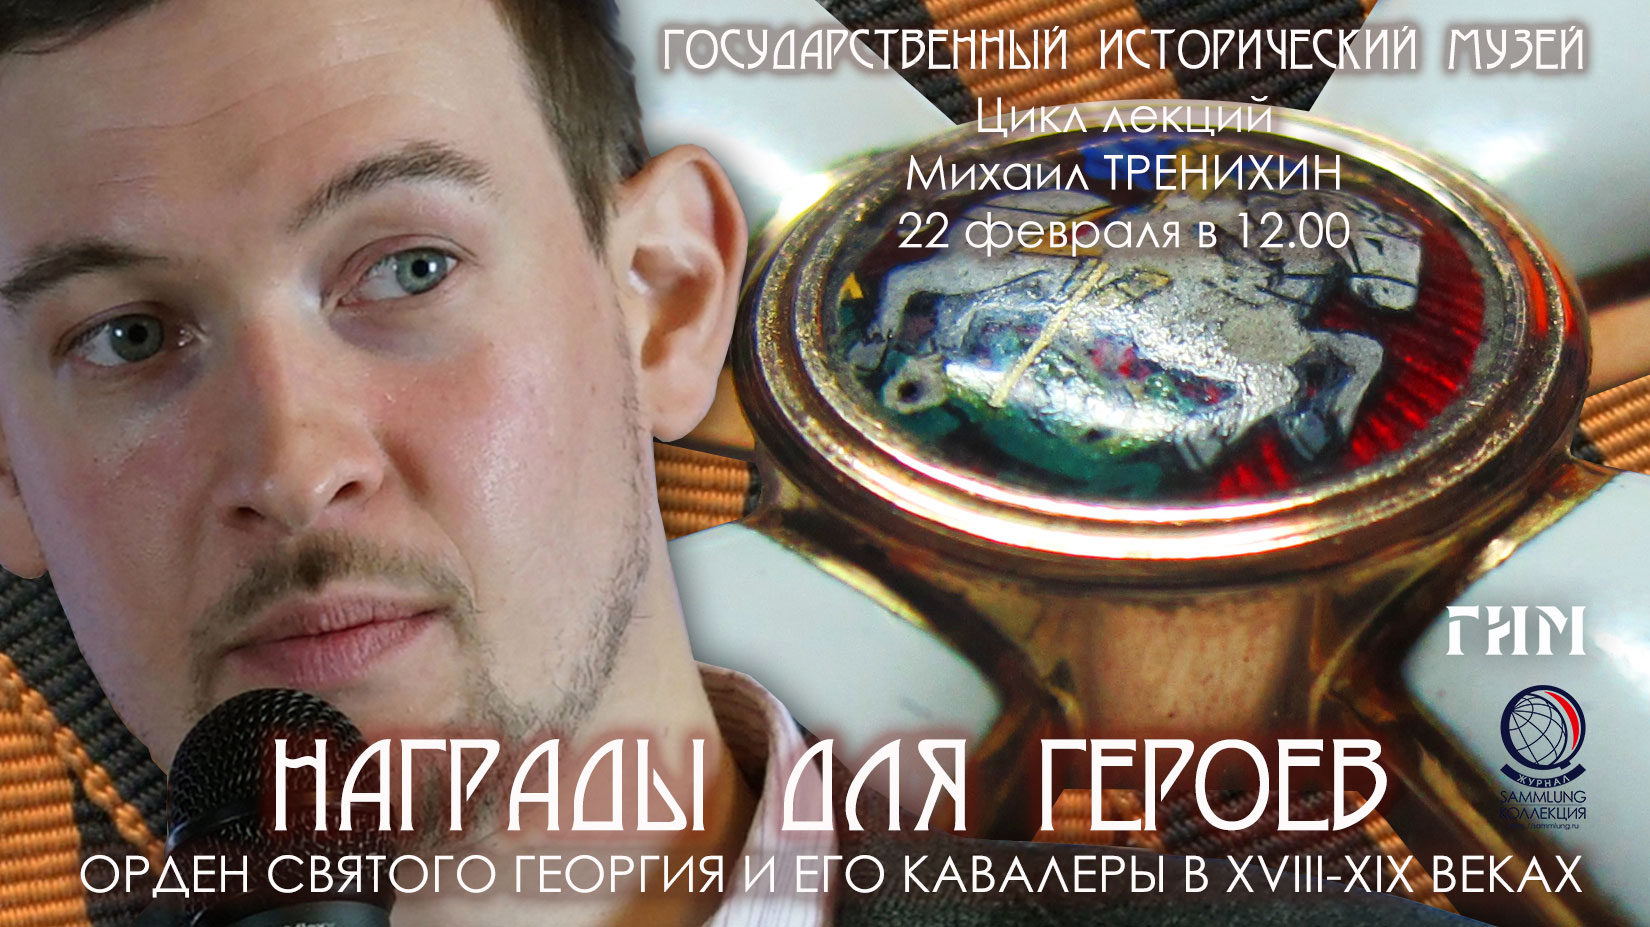 trenikhin-2020.02.14.jpg